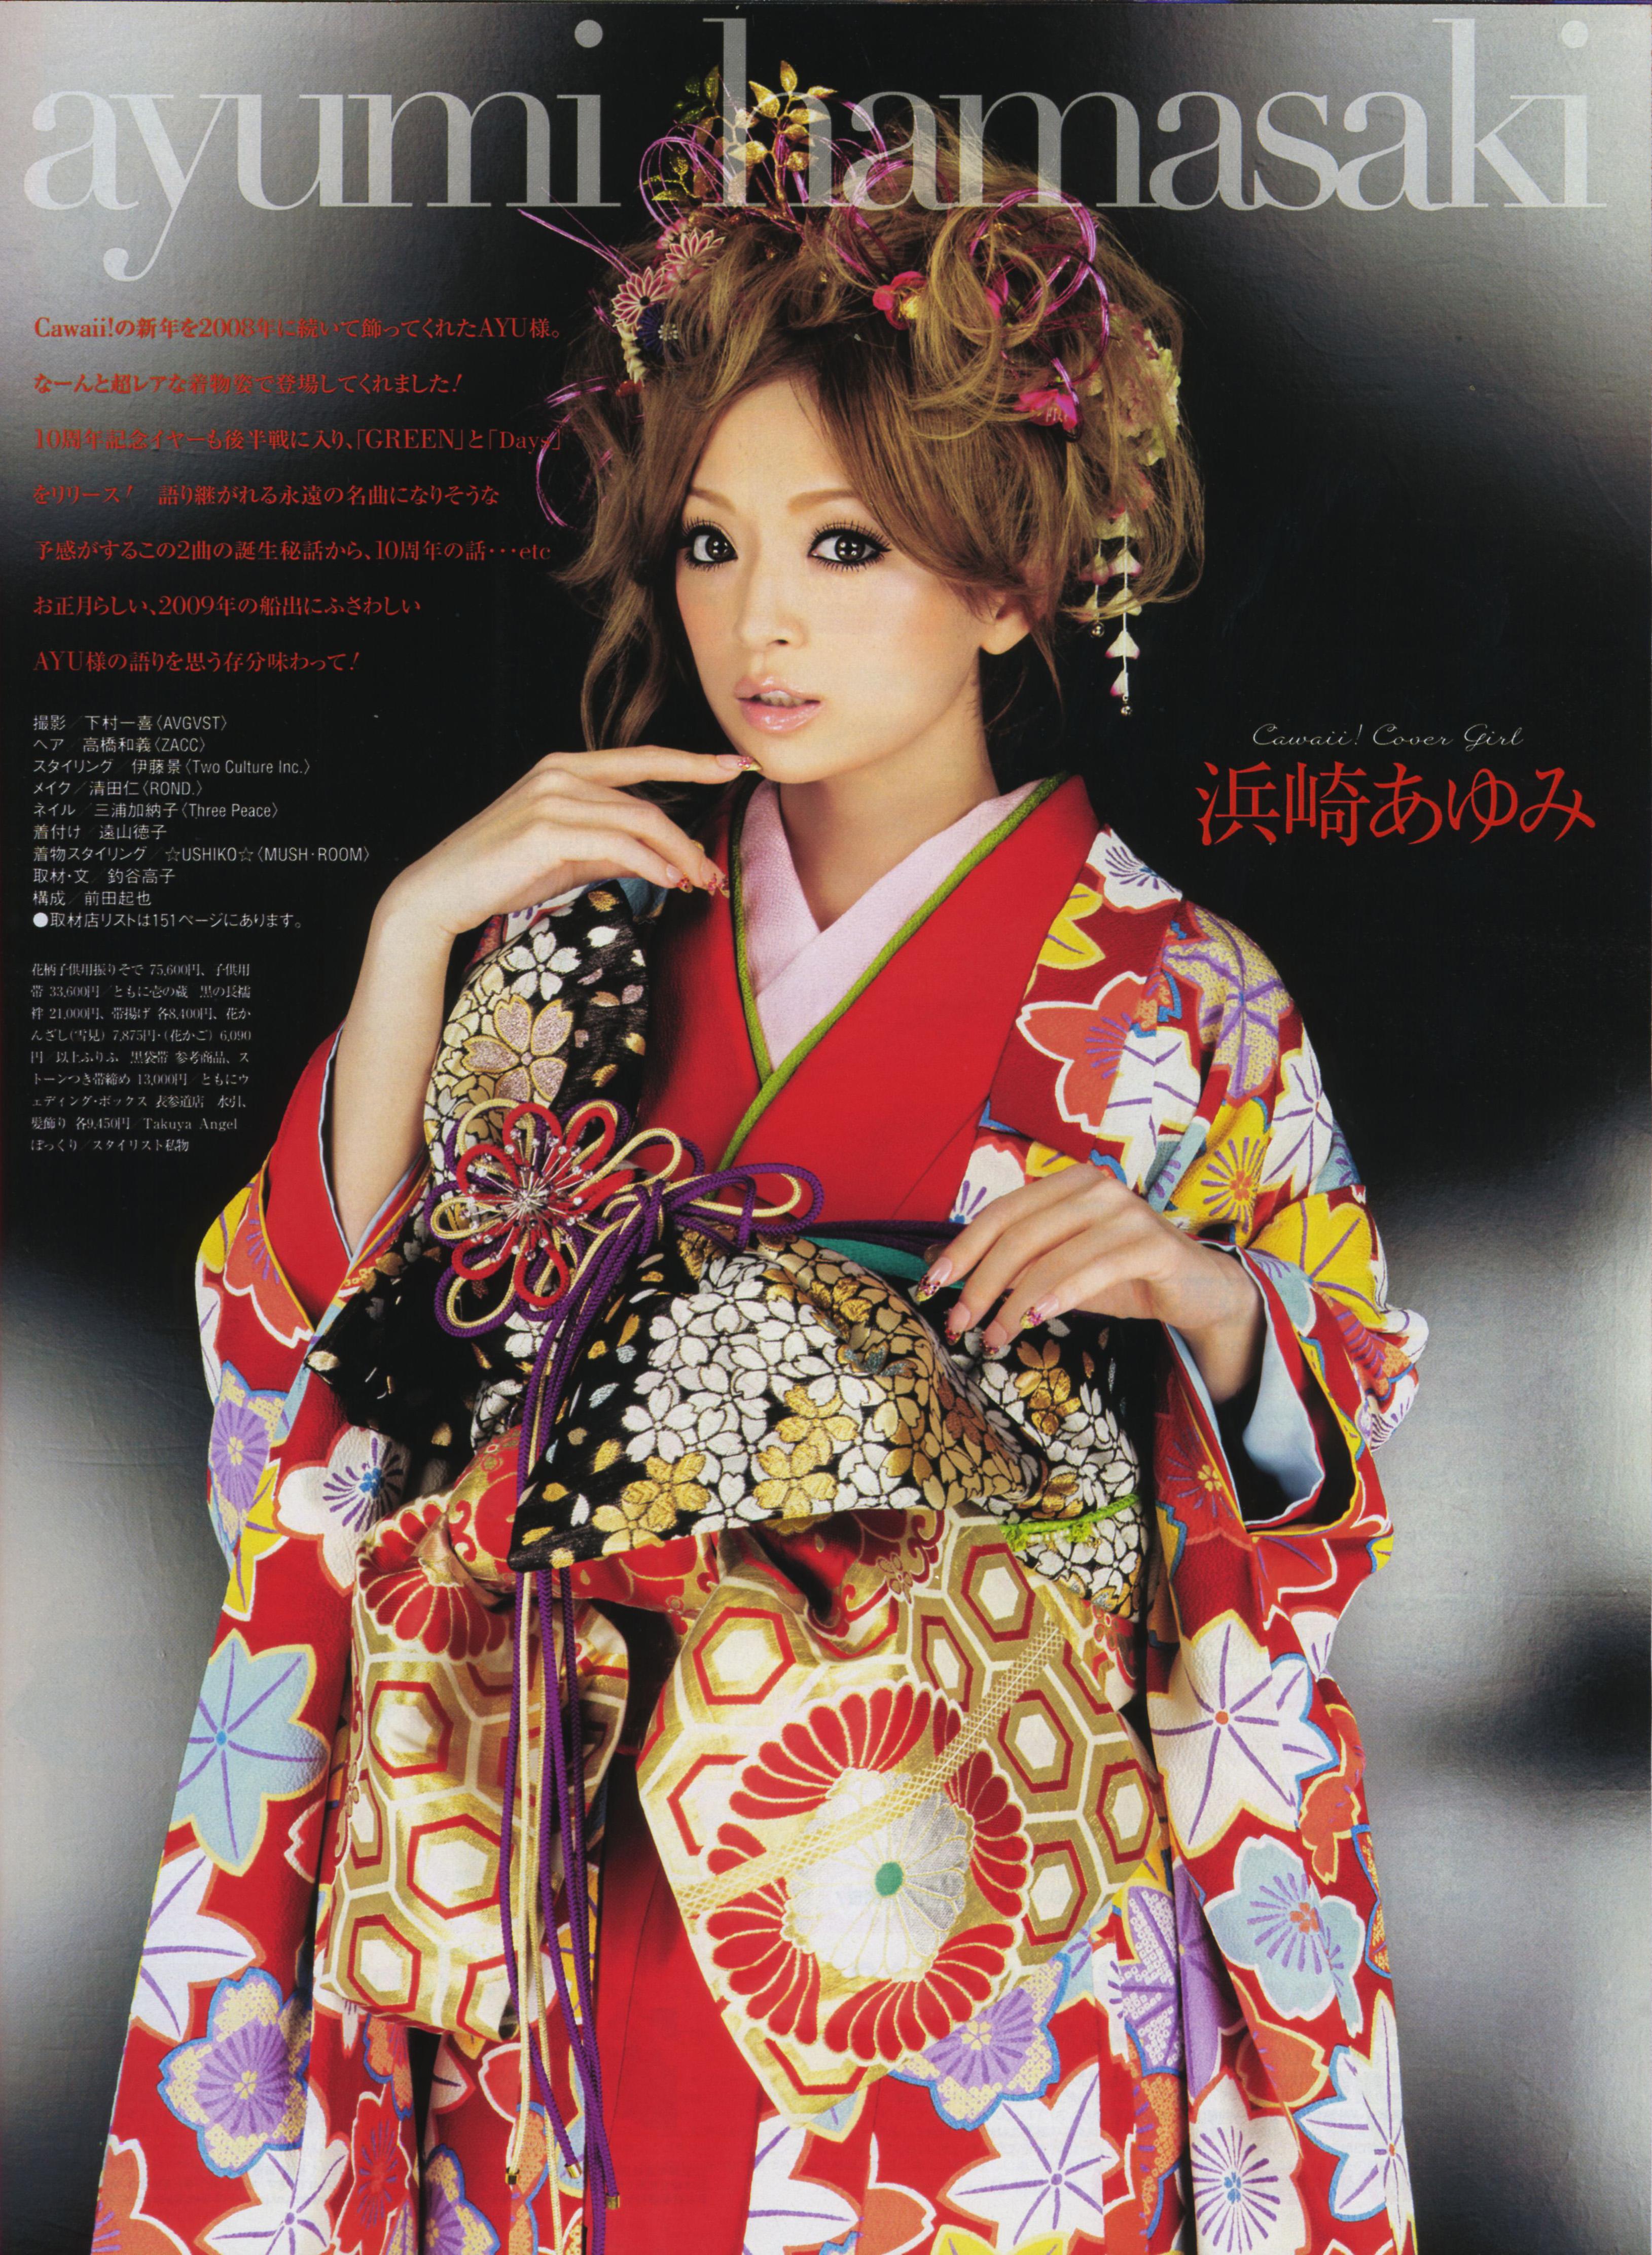 Ayumi Hamasaki Android Iphone Wallpaper Asiachan Kpop Jpop